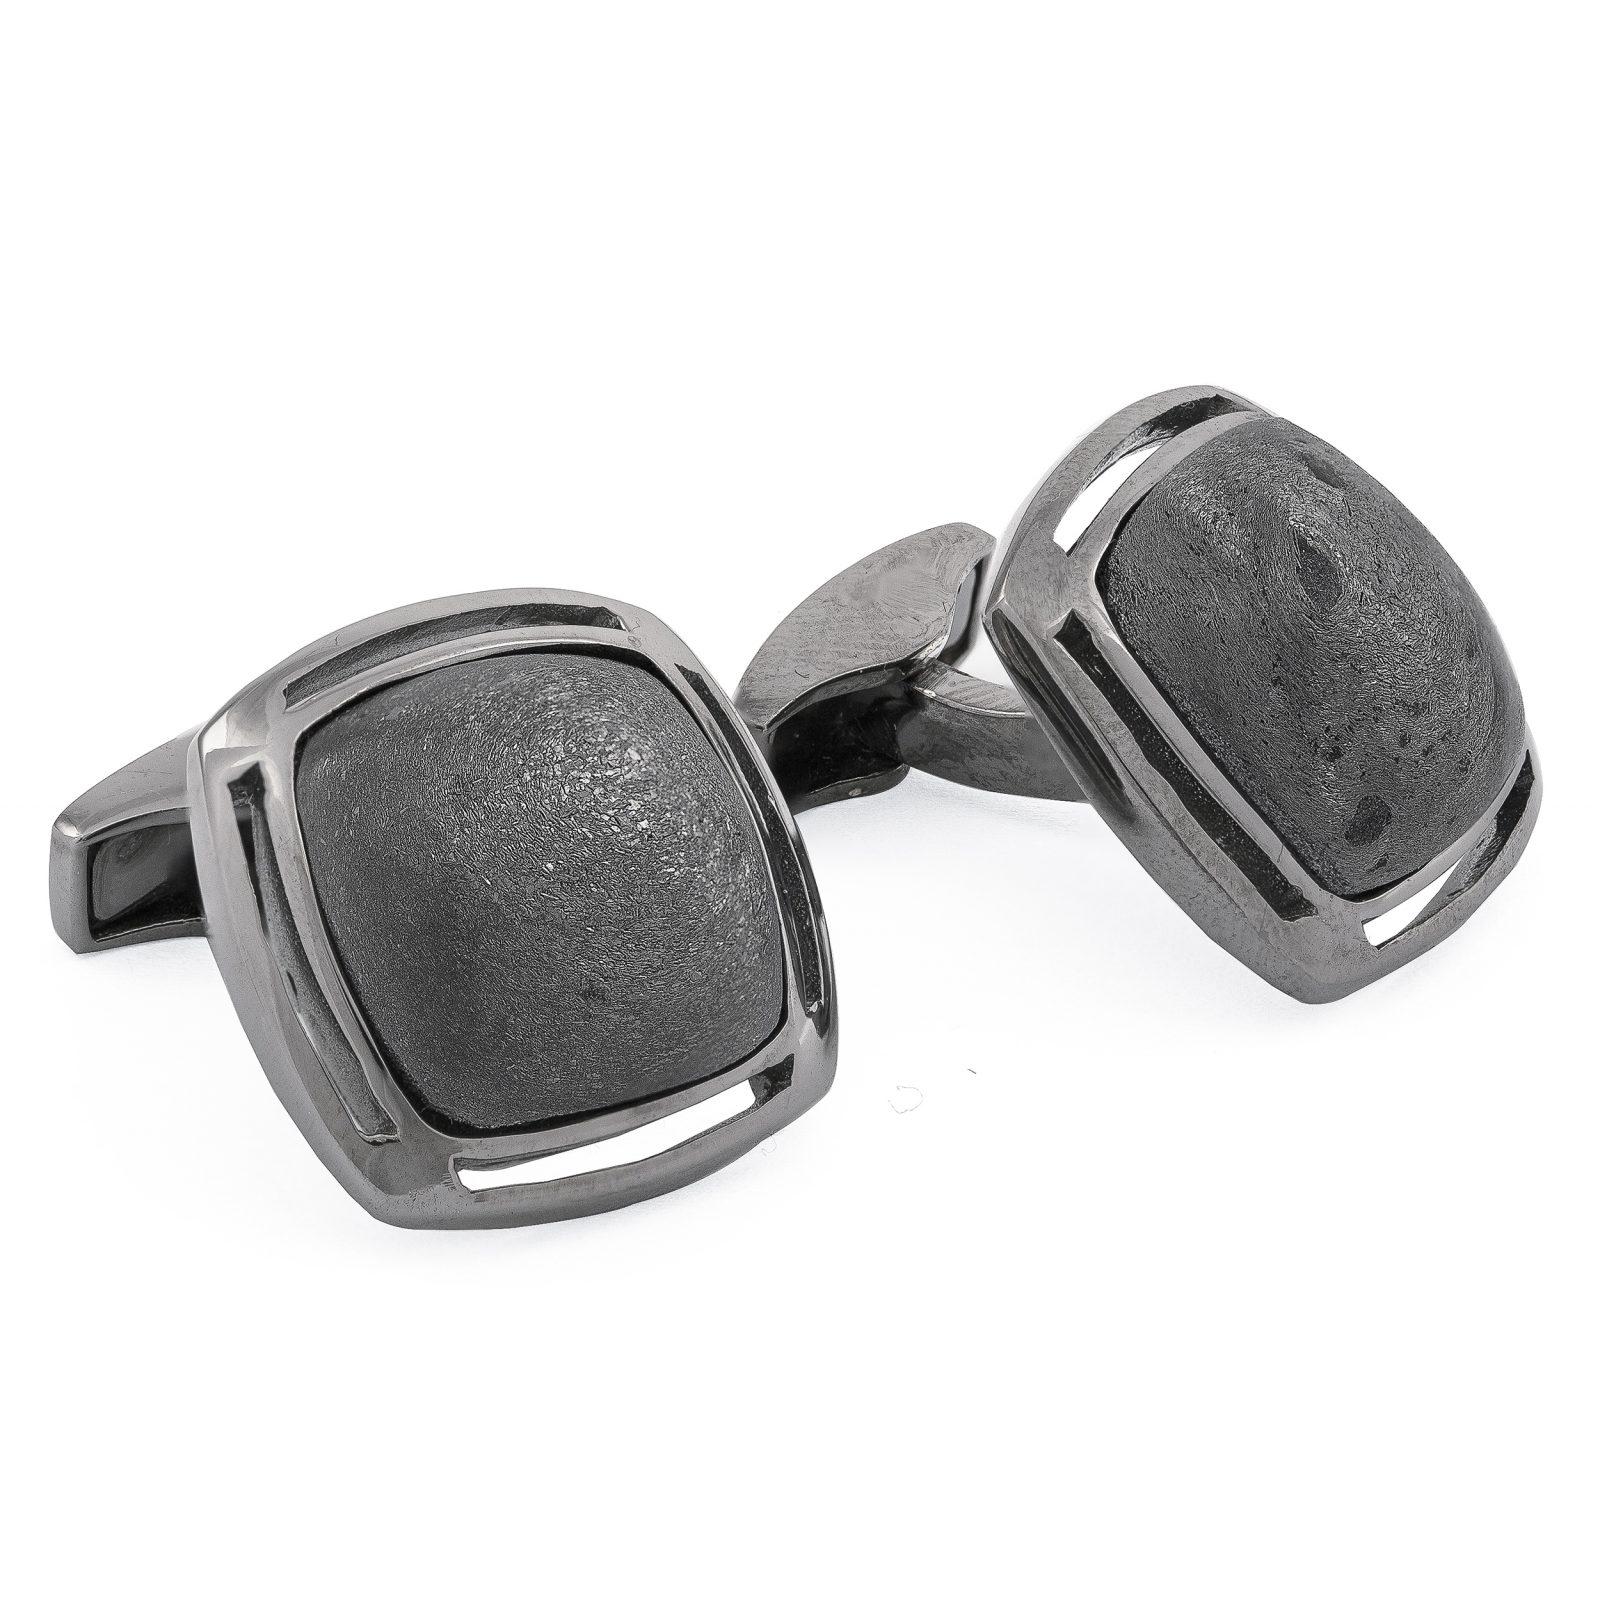 Davide Cotugno Executive Tailors Men's Custom Clothing - Tateossian Silver Specular Hematite Cufflinks